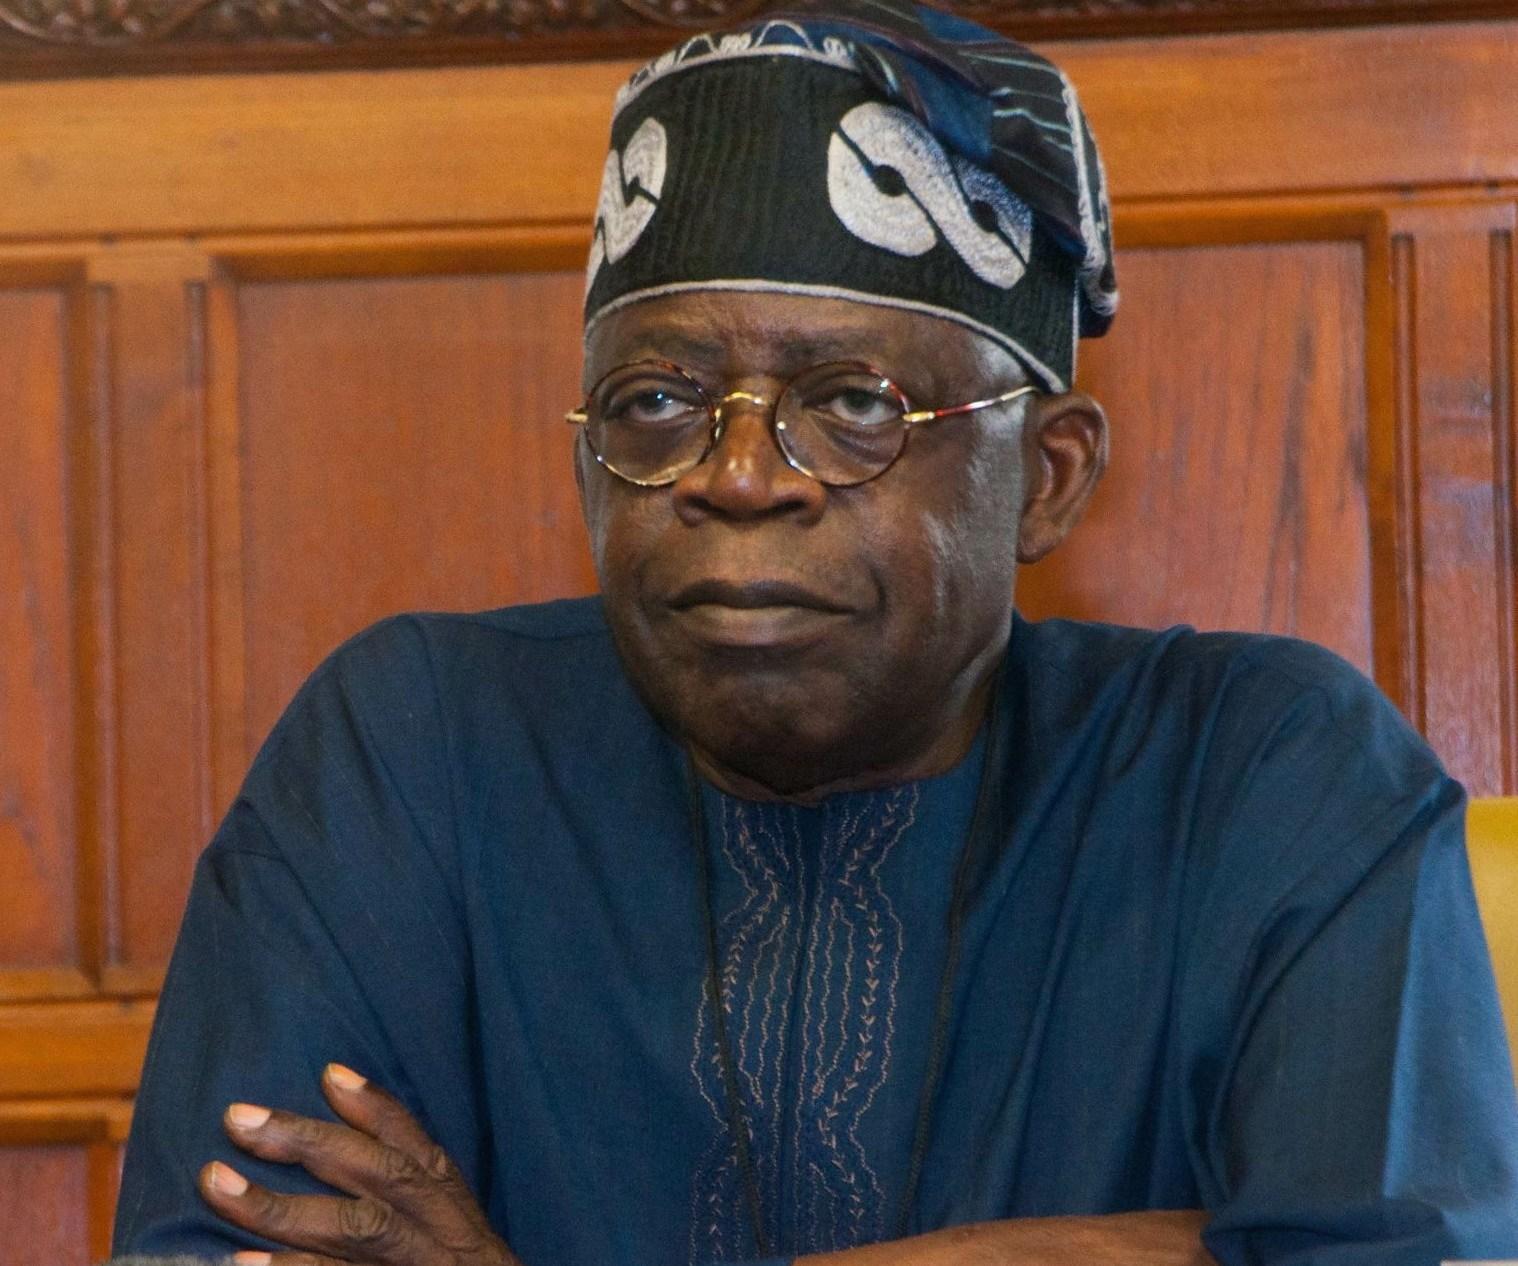 Tinubu in good position to lead Nigeria in 2023 - Lagos APC